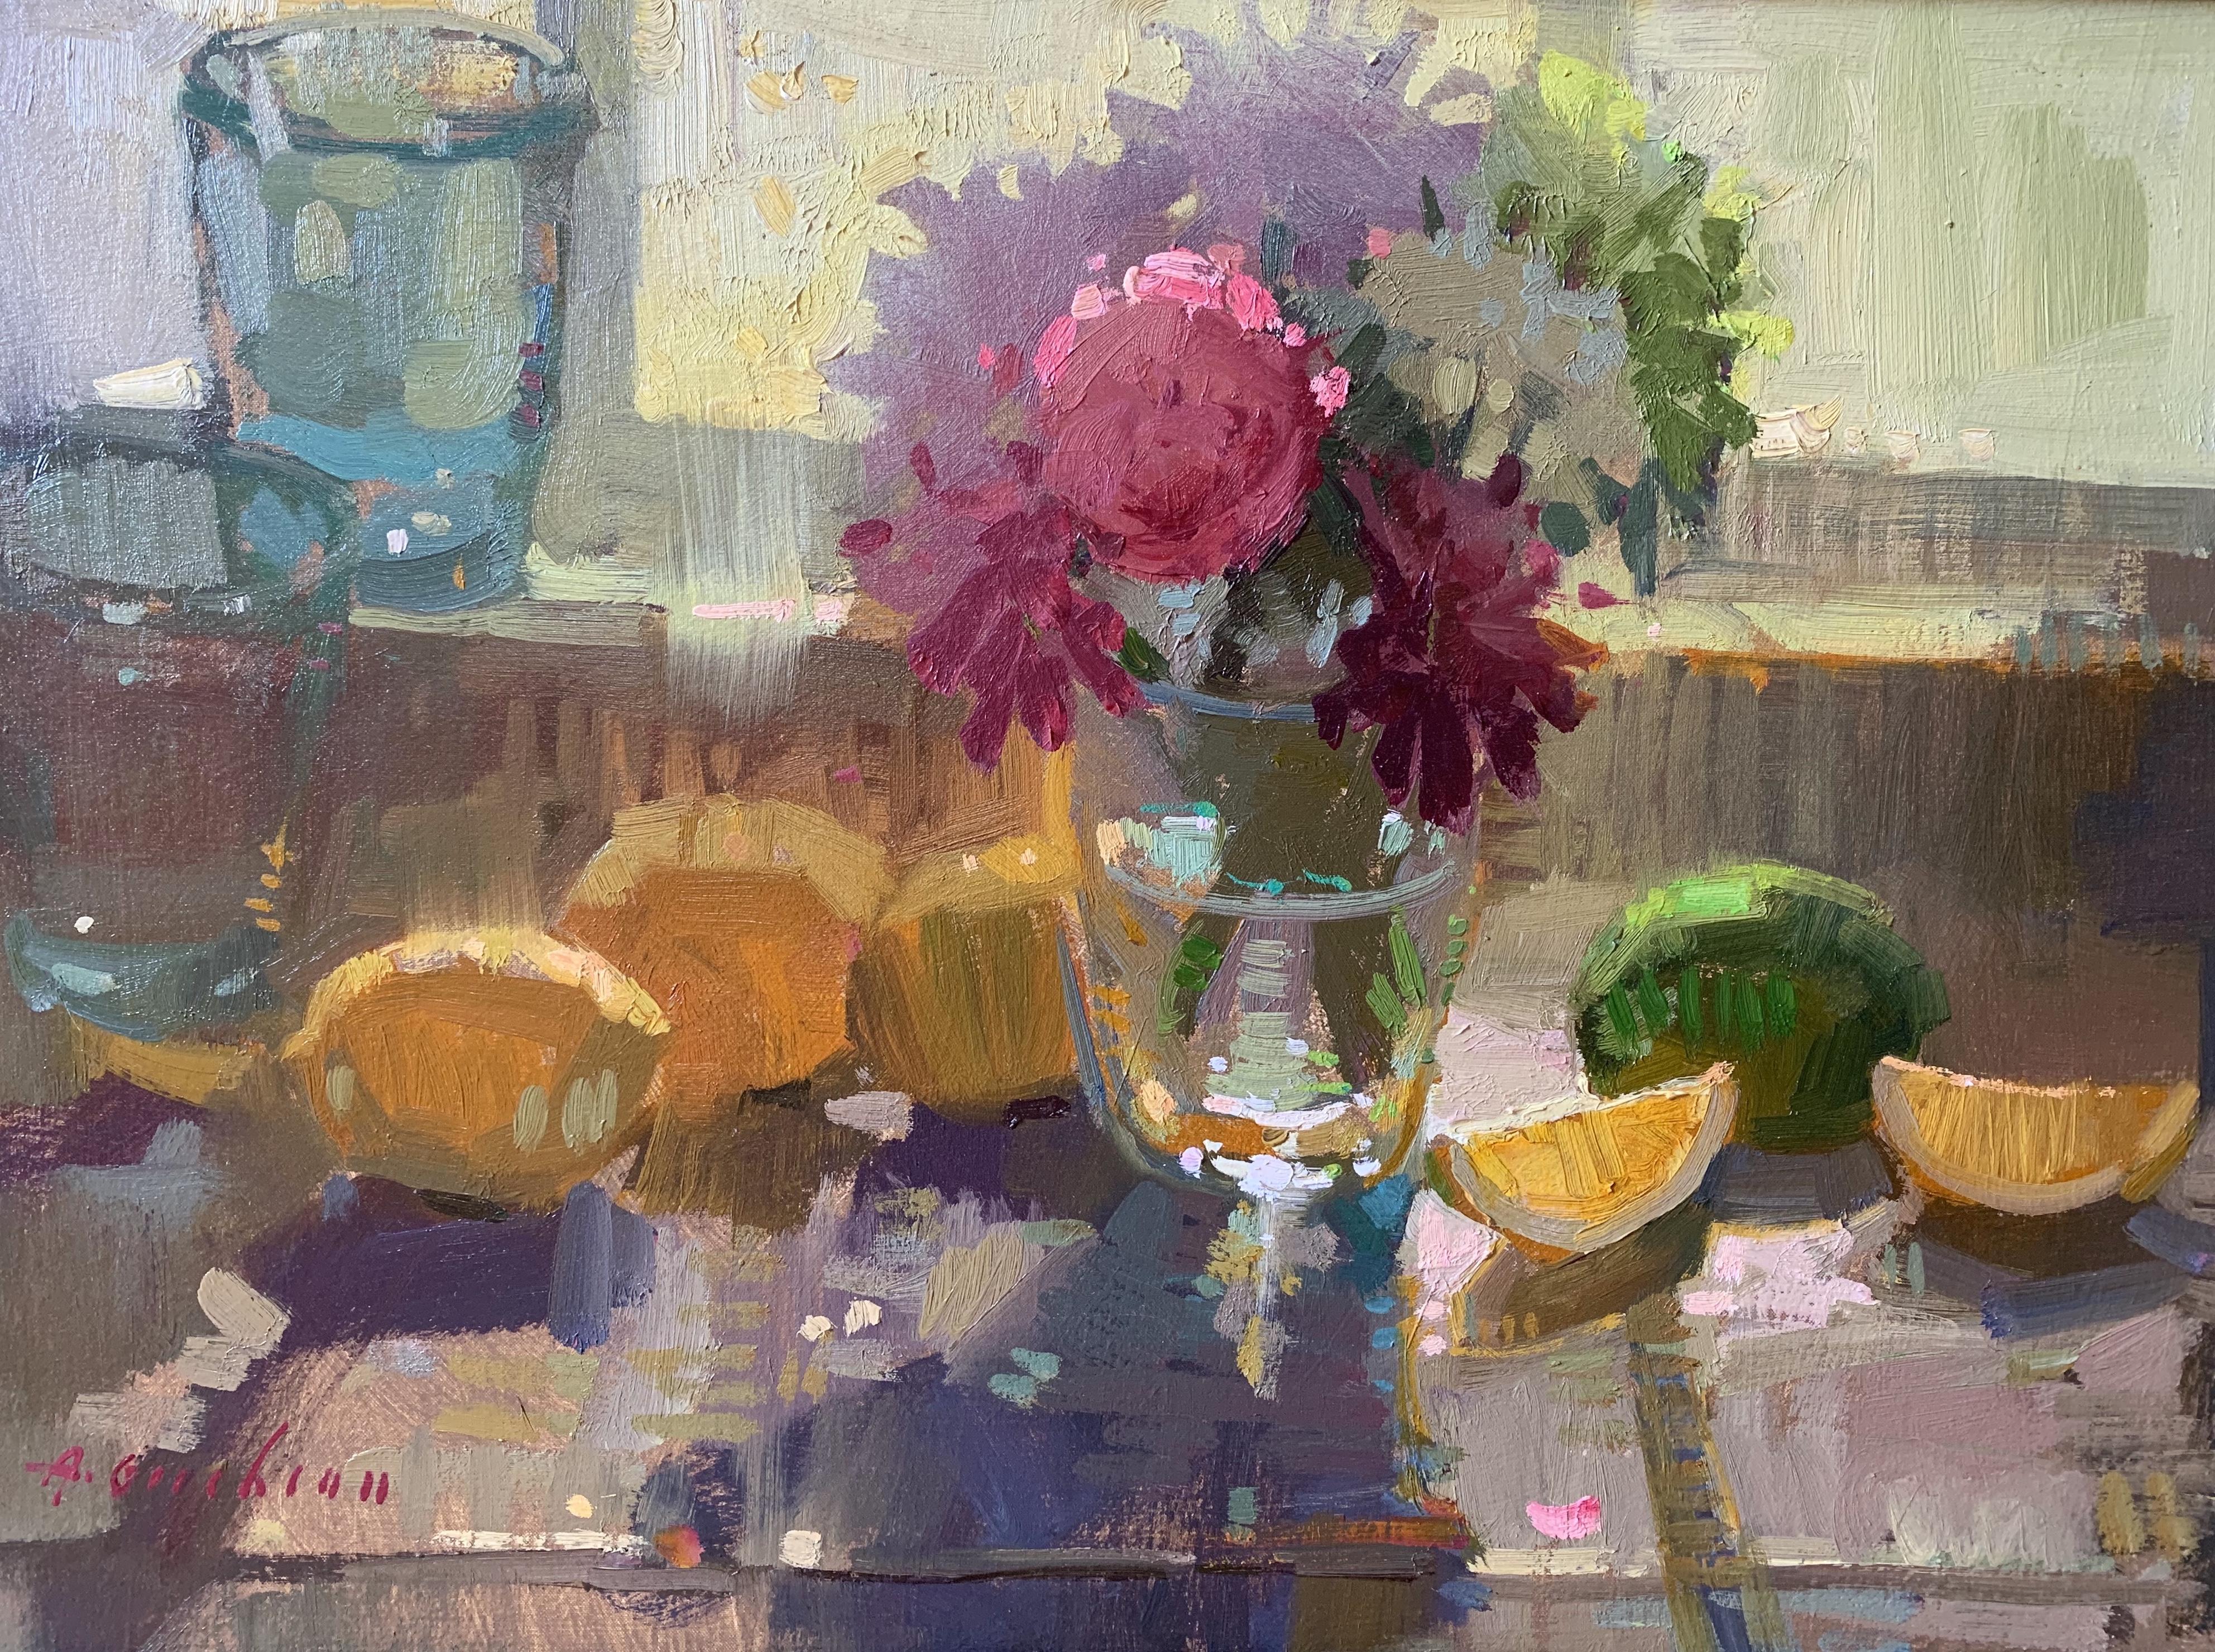 Kitchen Window, Lemons